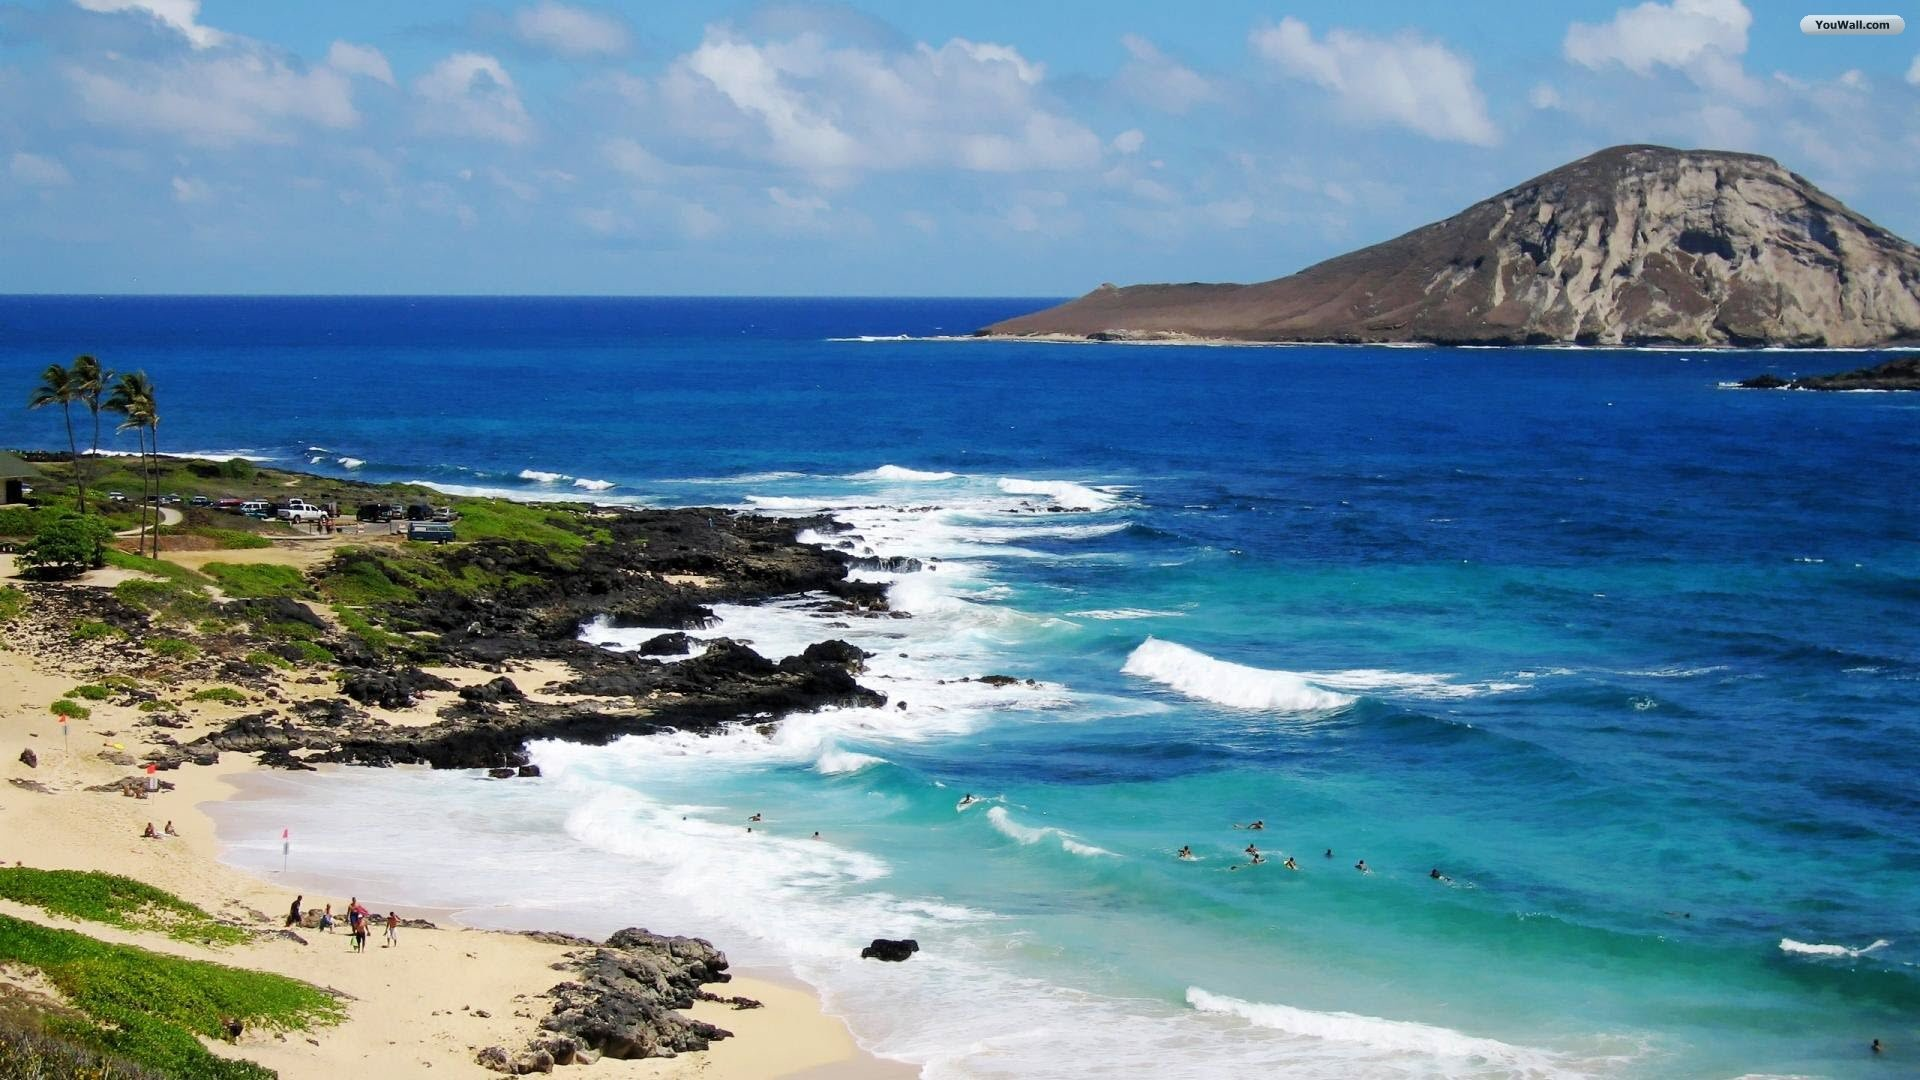 Hawaii Beaches wallpaper – 814938